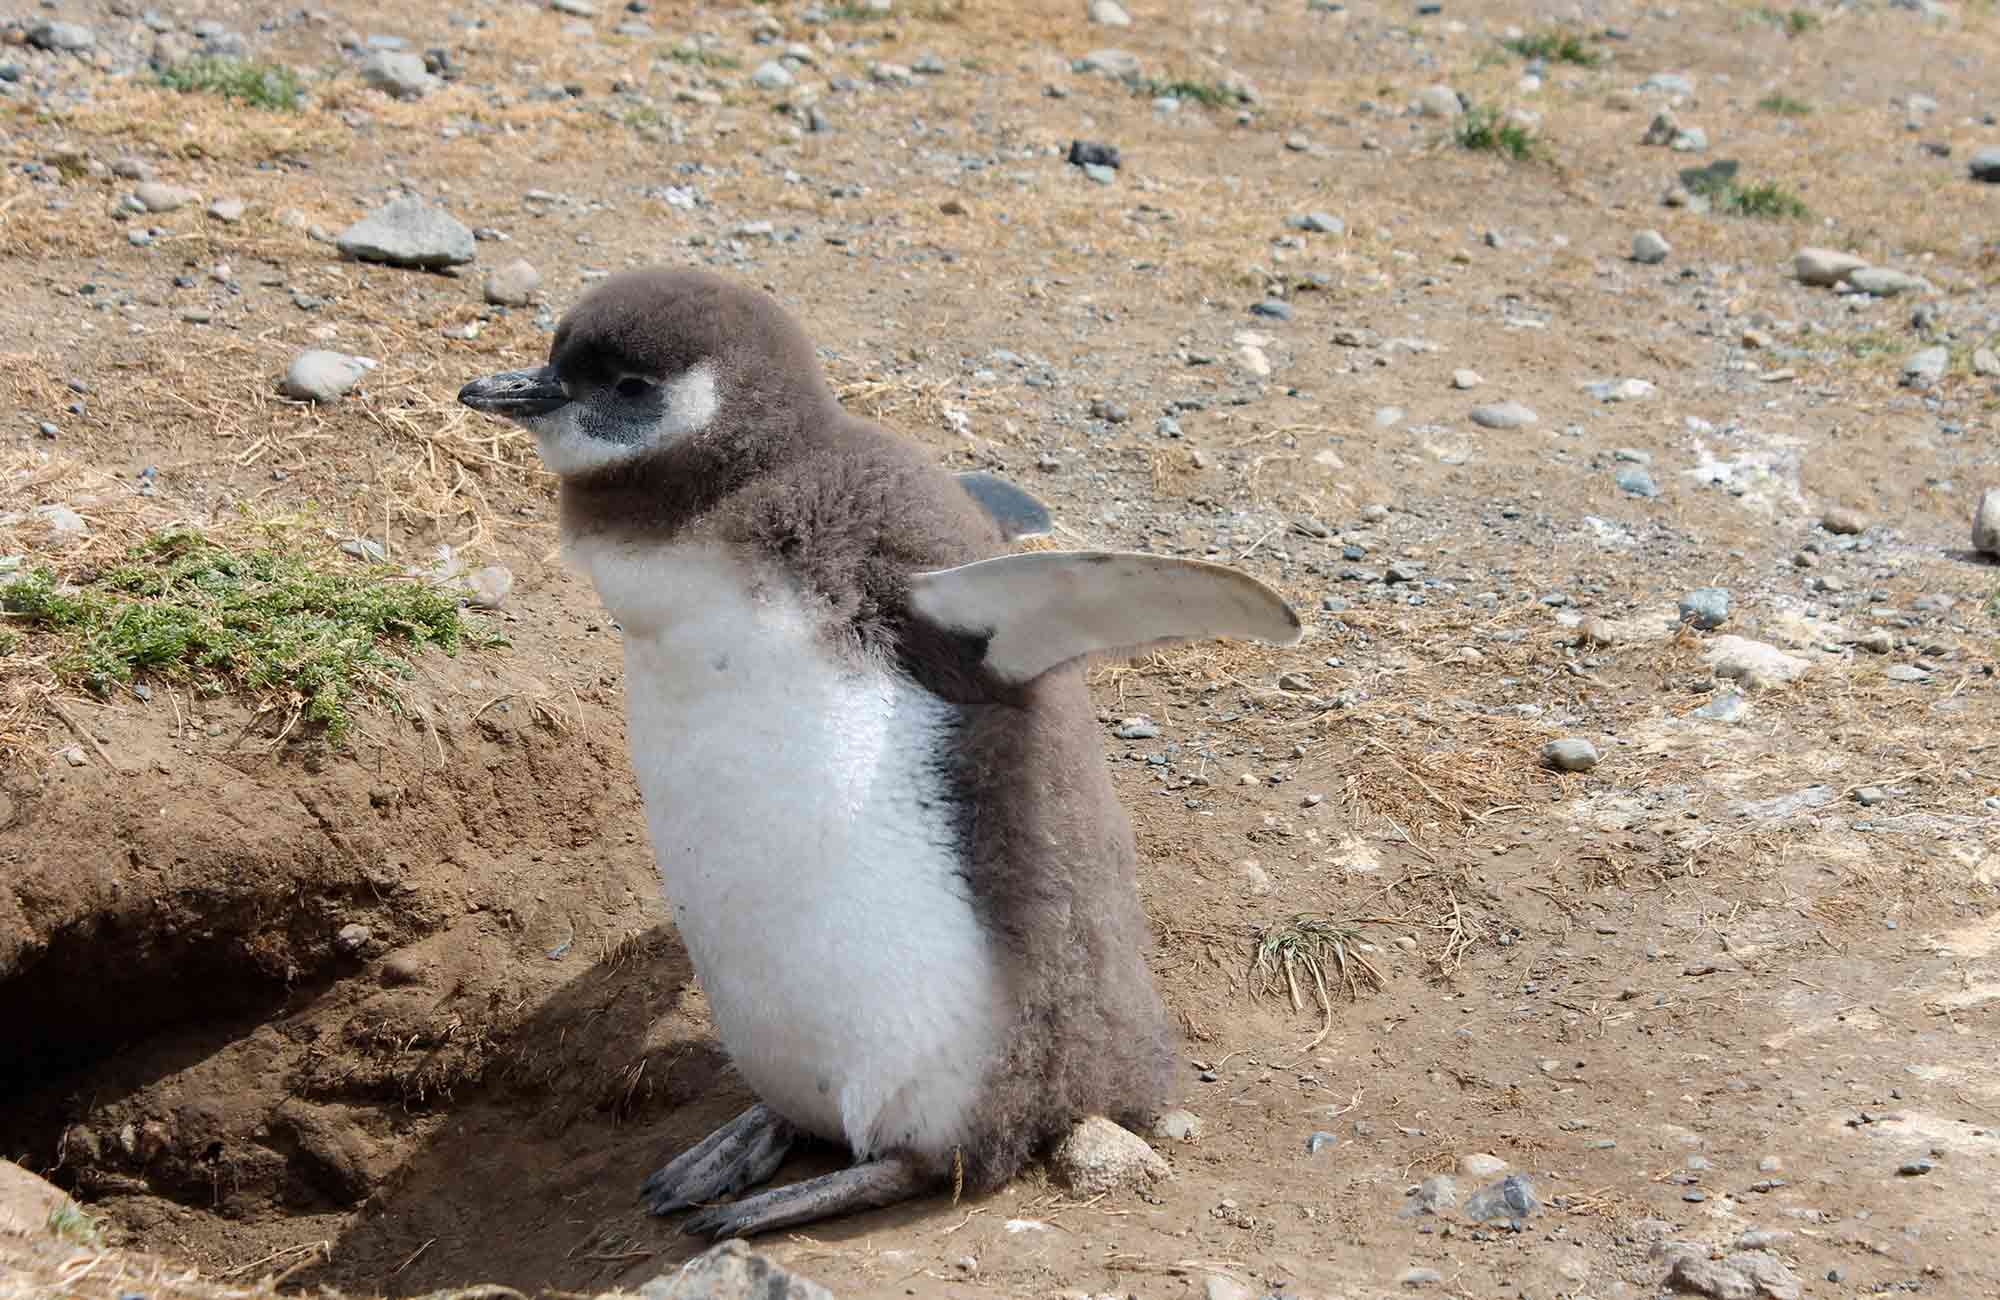 Voyage Chili - Pinguin Iles Magdalena - Amplitudes